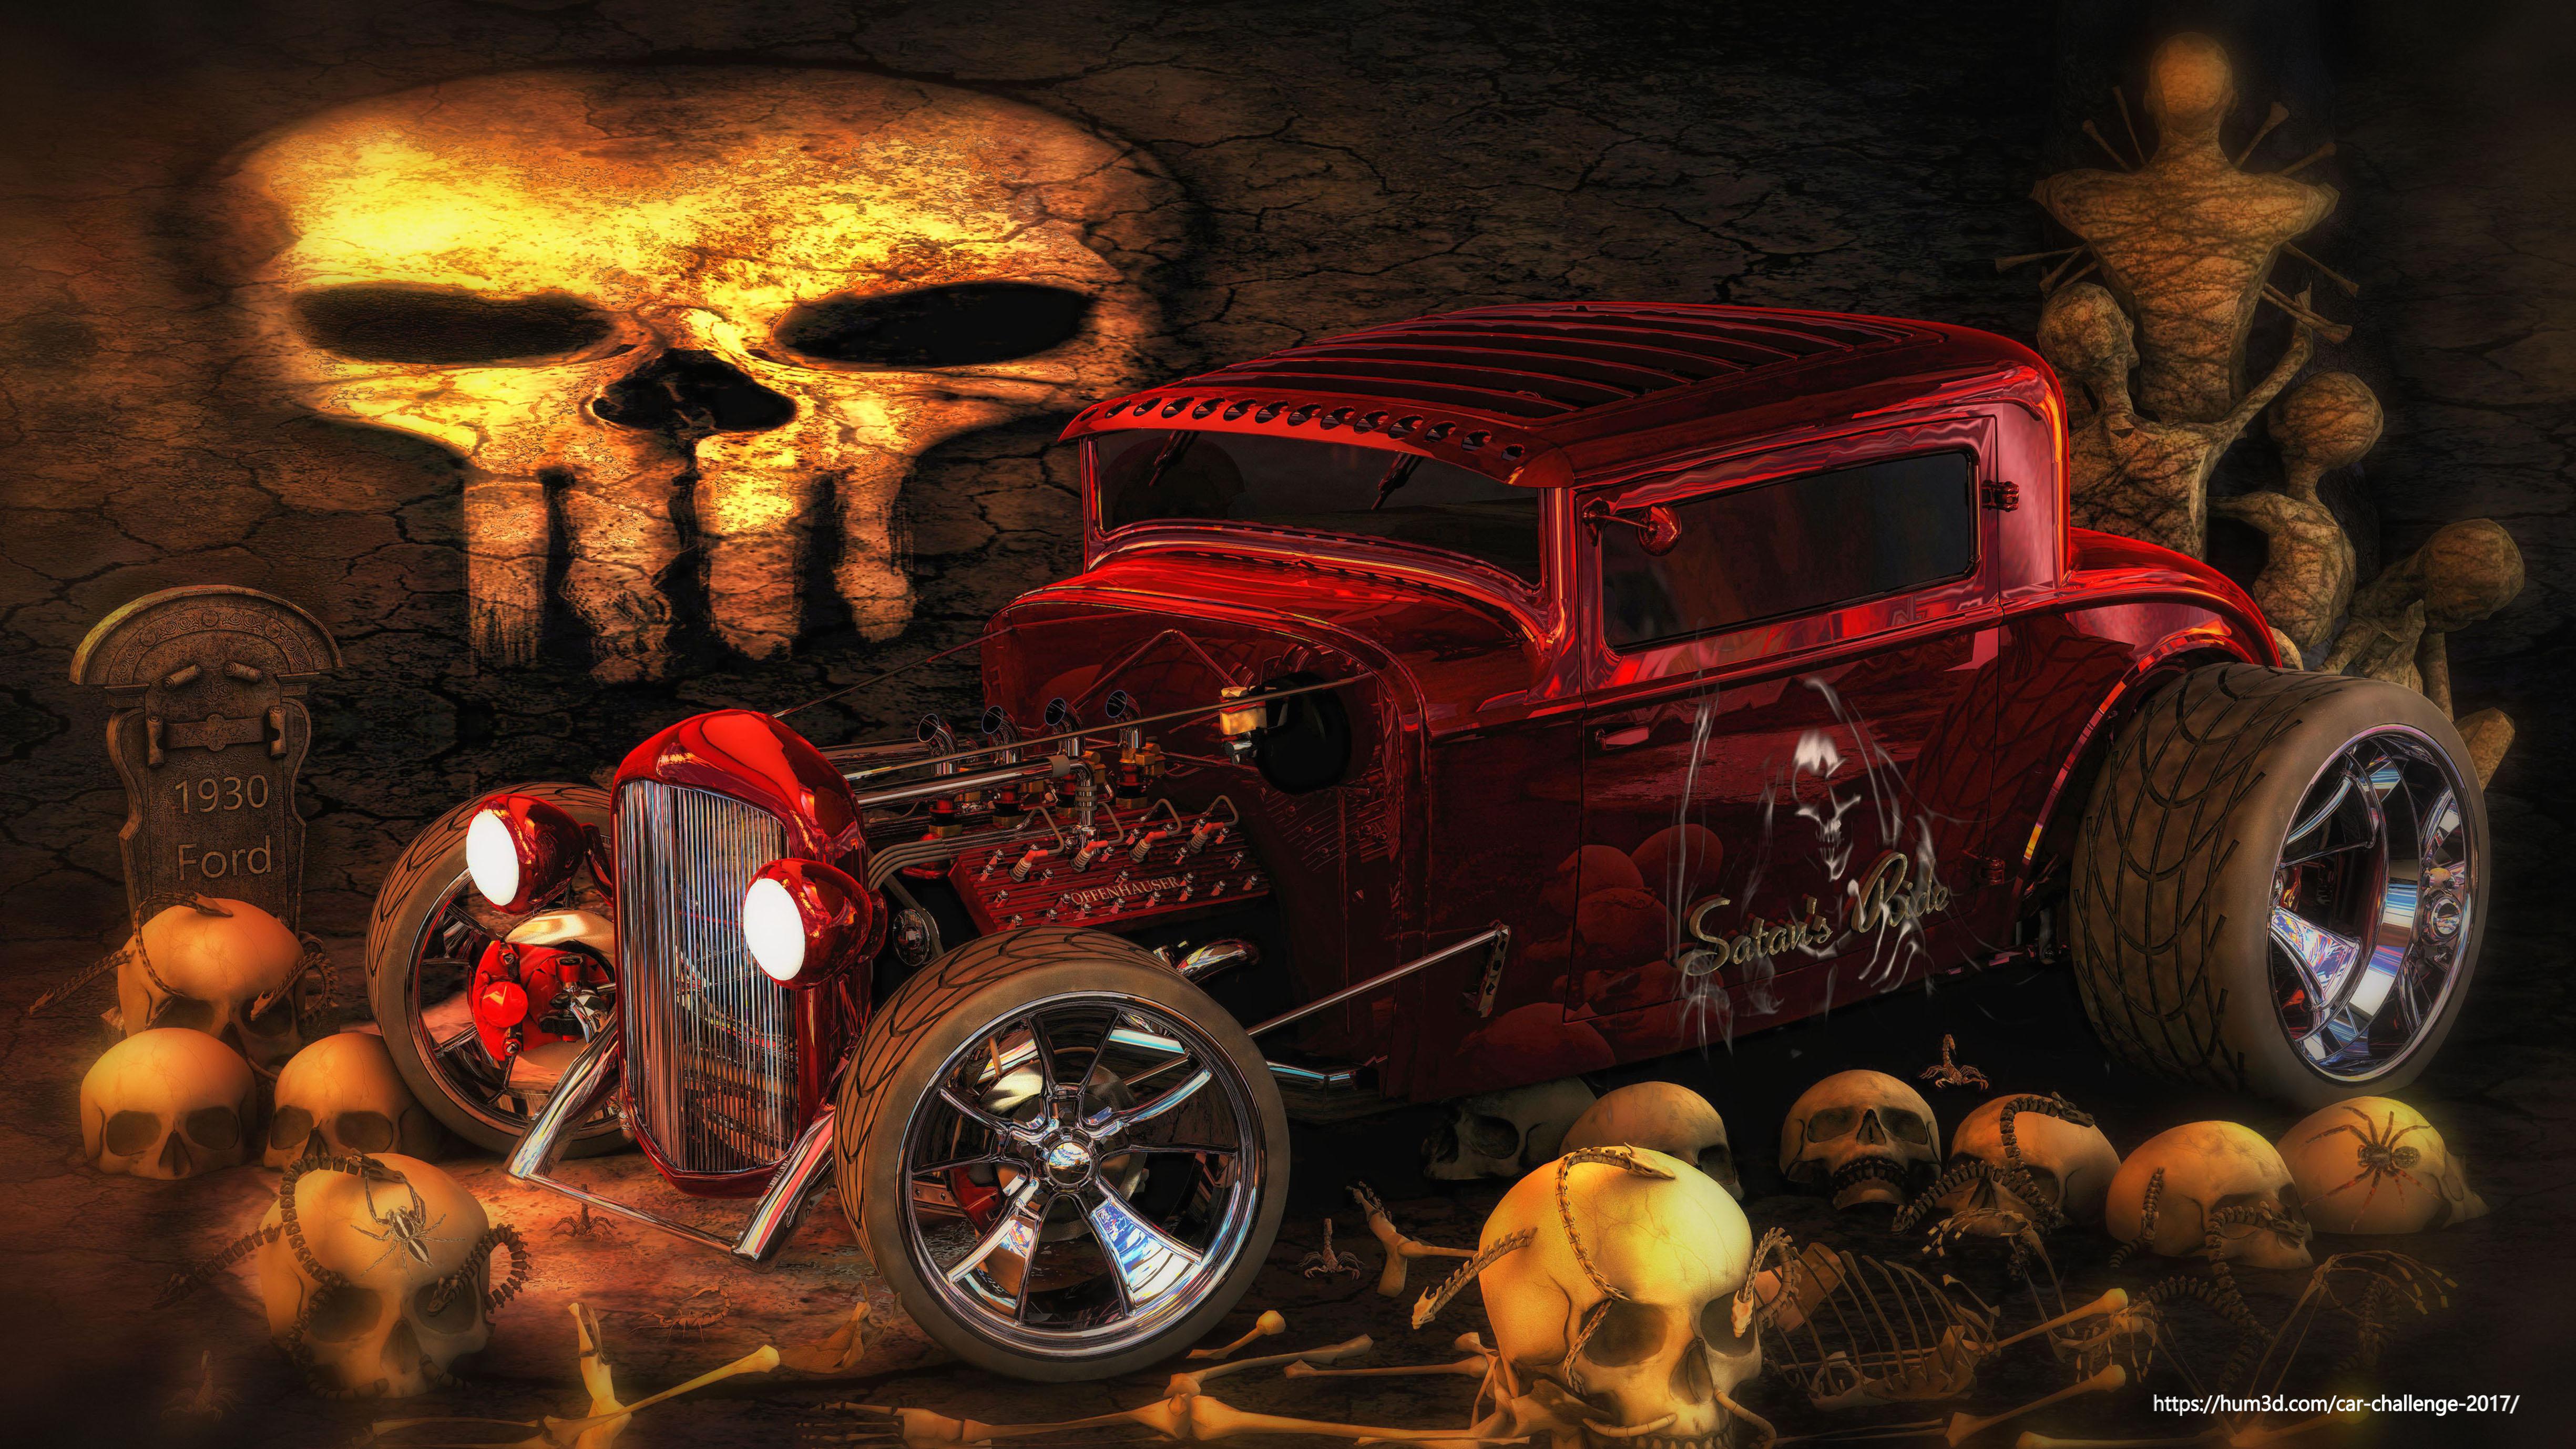 Satan's ride